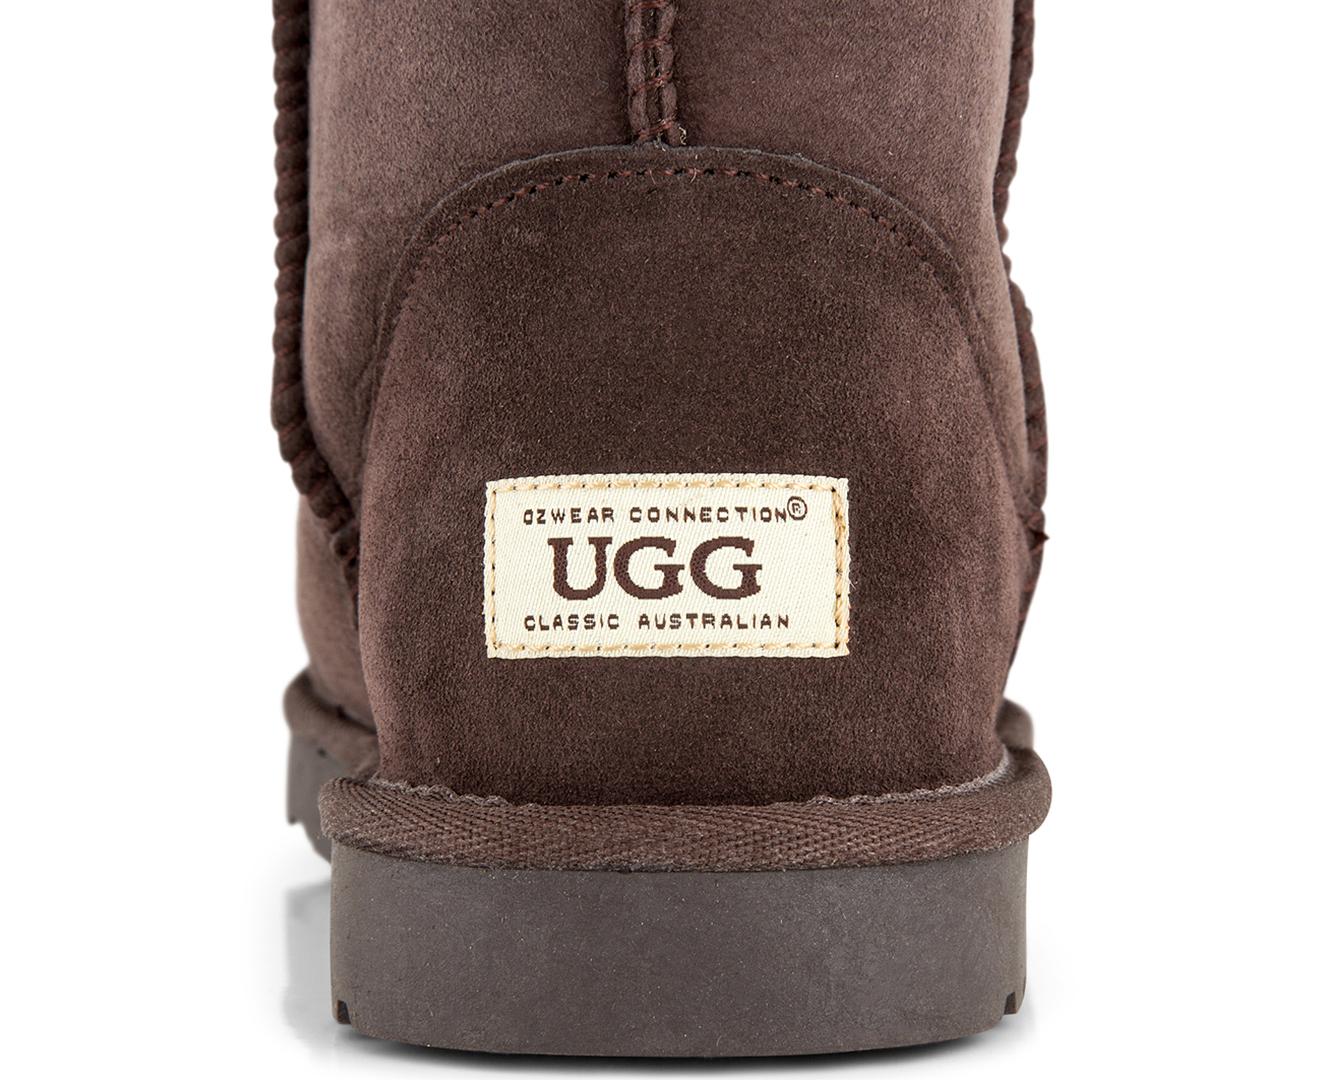 72aad8b9c45 Ozwear Connection Classic Long Ugg Boot